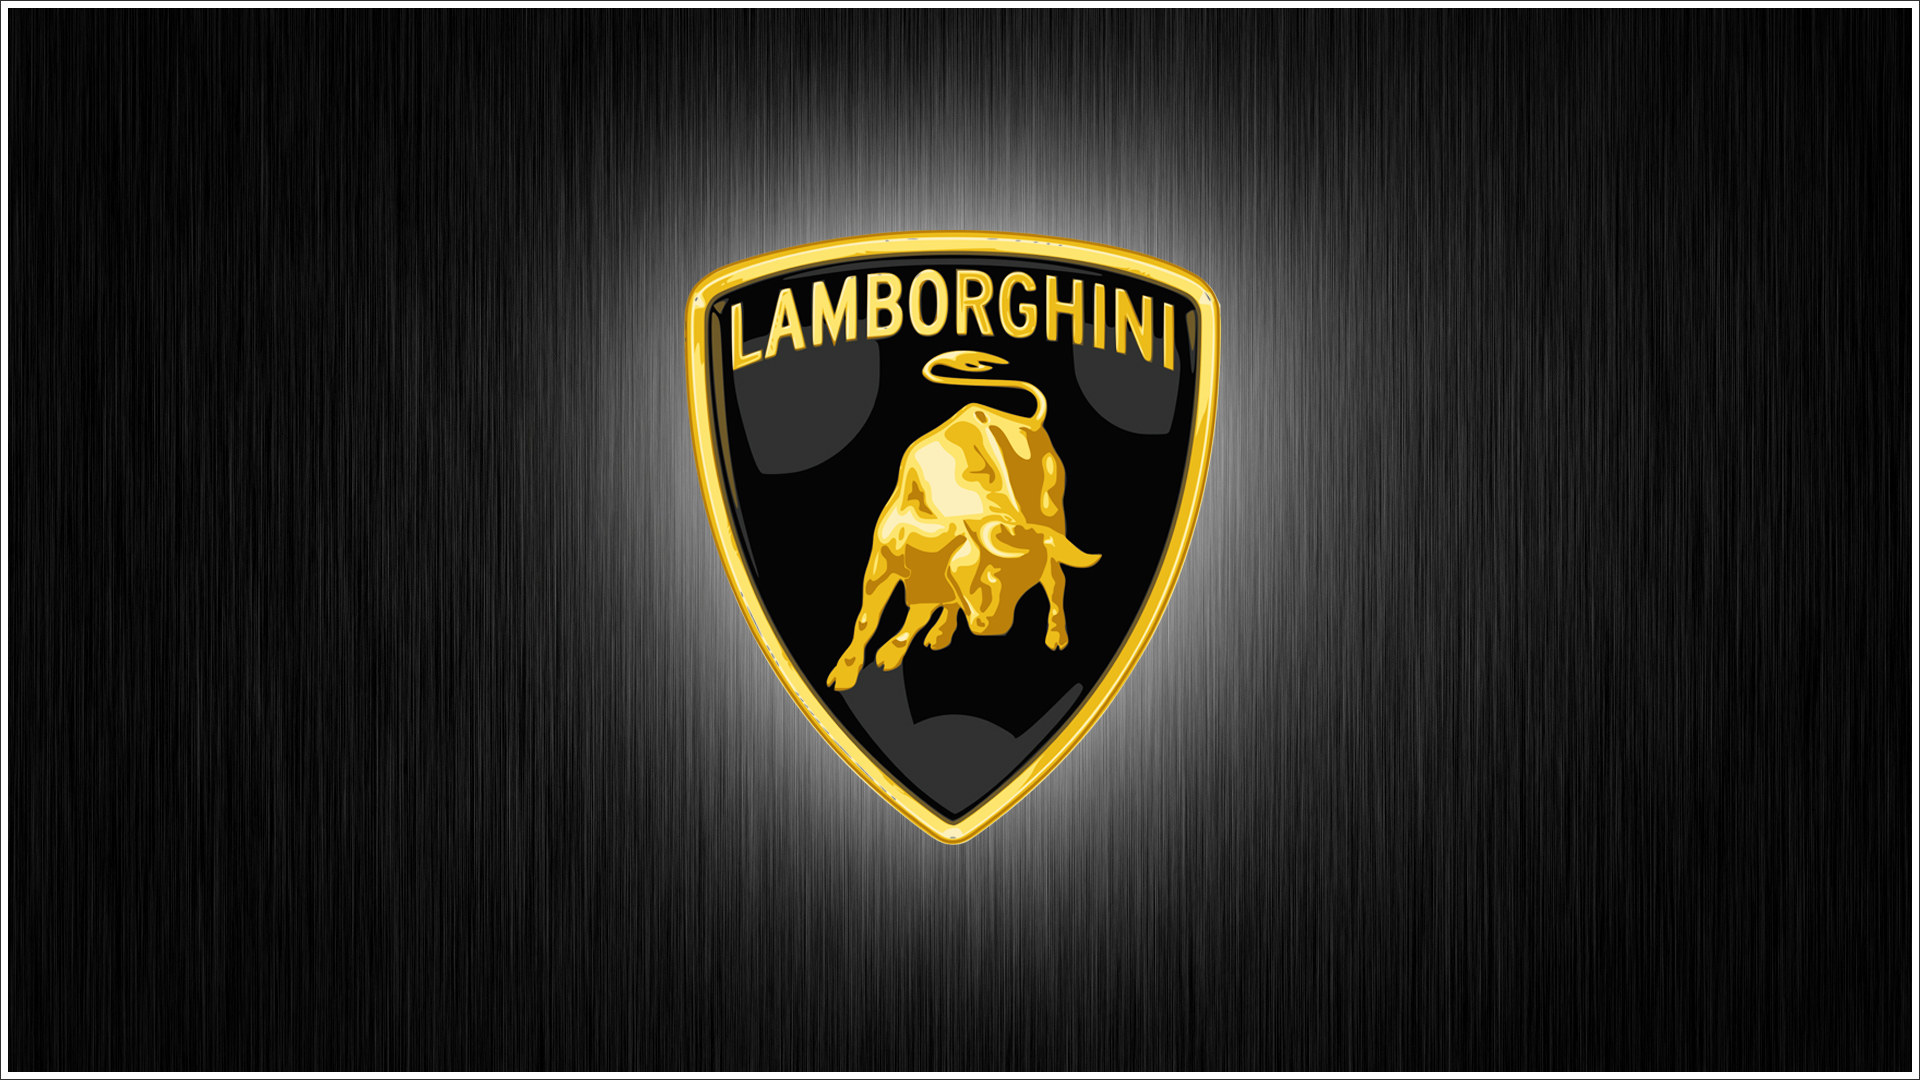 72] Lamborgini Logo Wallpaper on WallpaperSafari 1920x1080